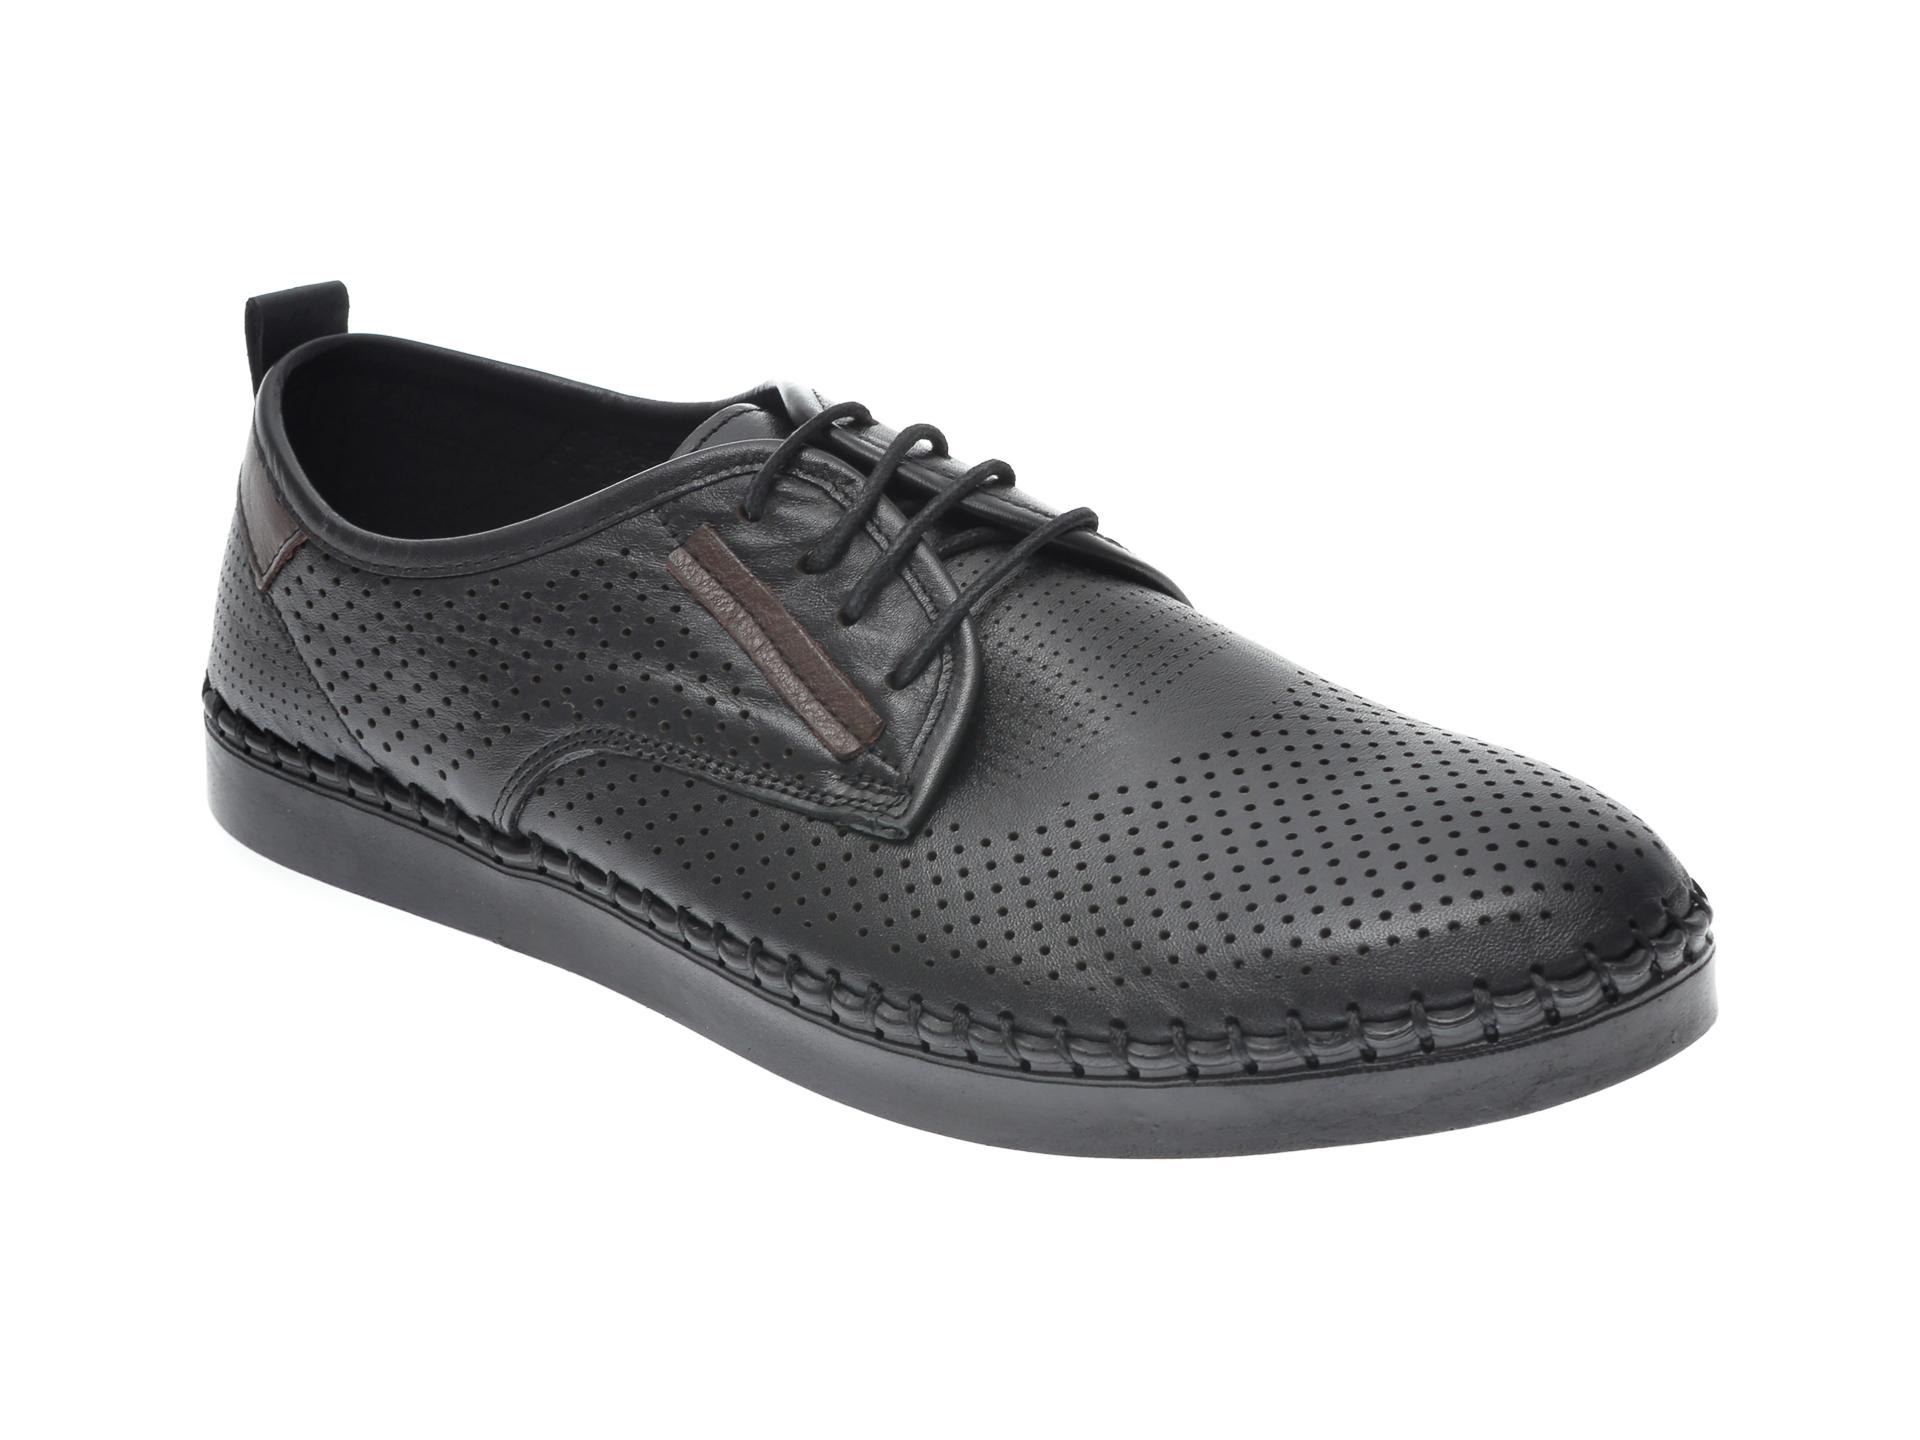 Pantofi Otter Negri, 2871, Din Piele Naturala